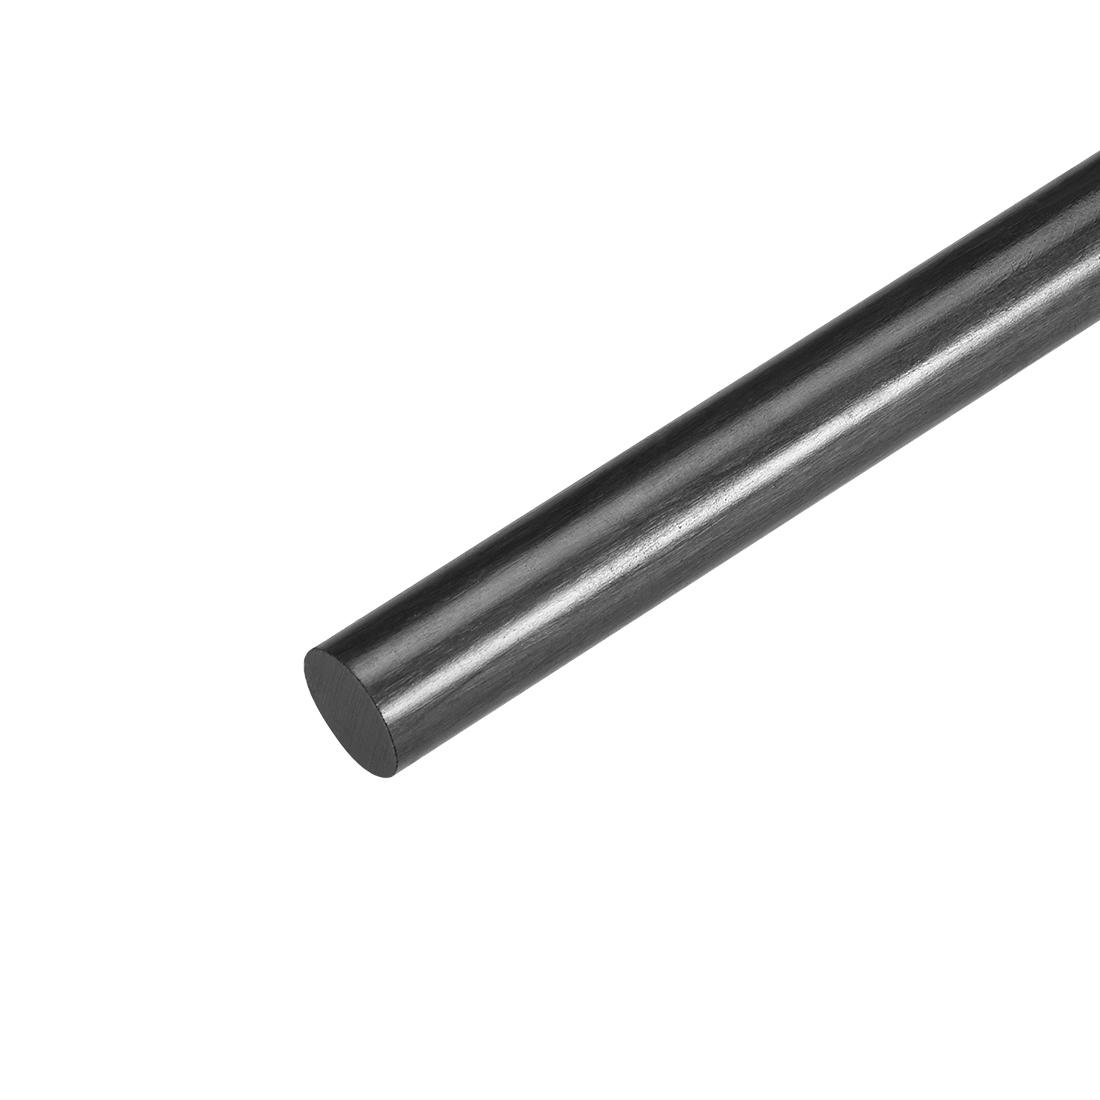 8.5mm Carbon Fiber Bar For RC Airplane Matte Pole US, 200mm 7.8 inch